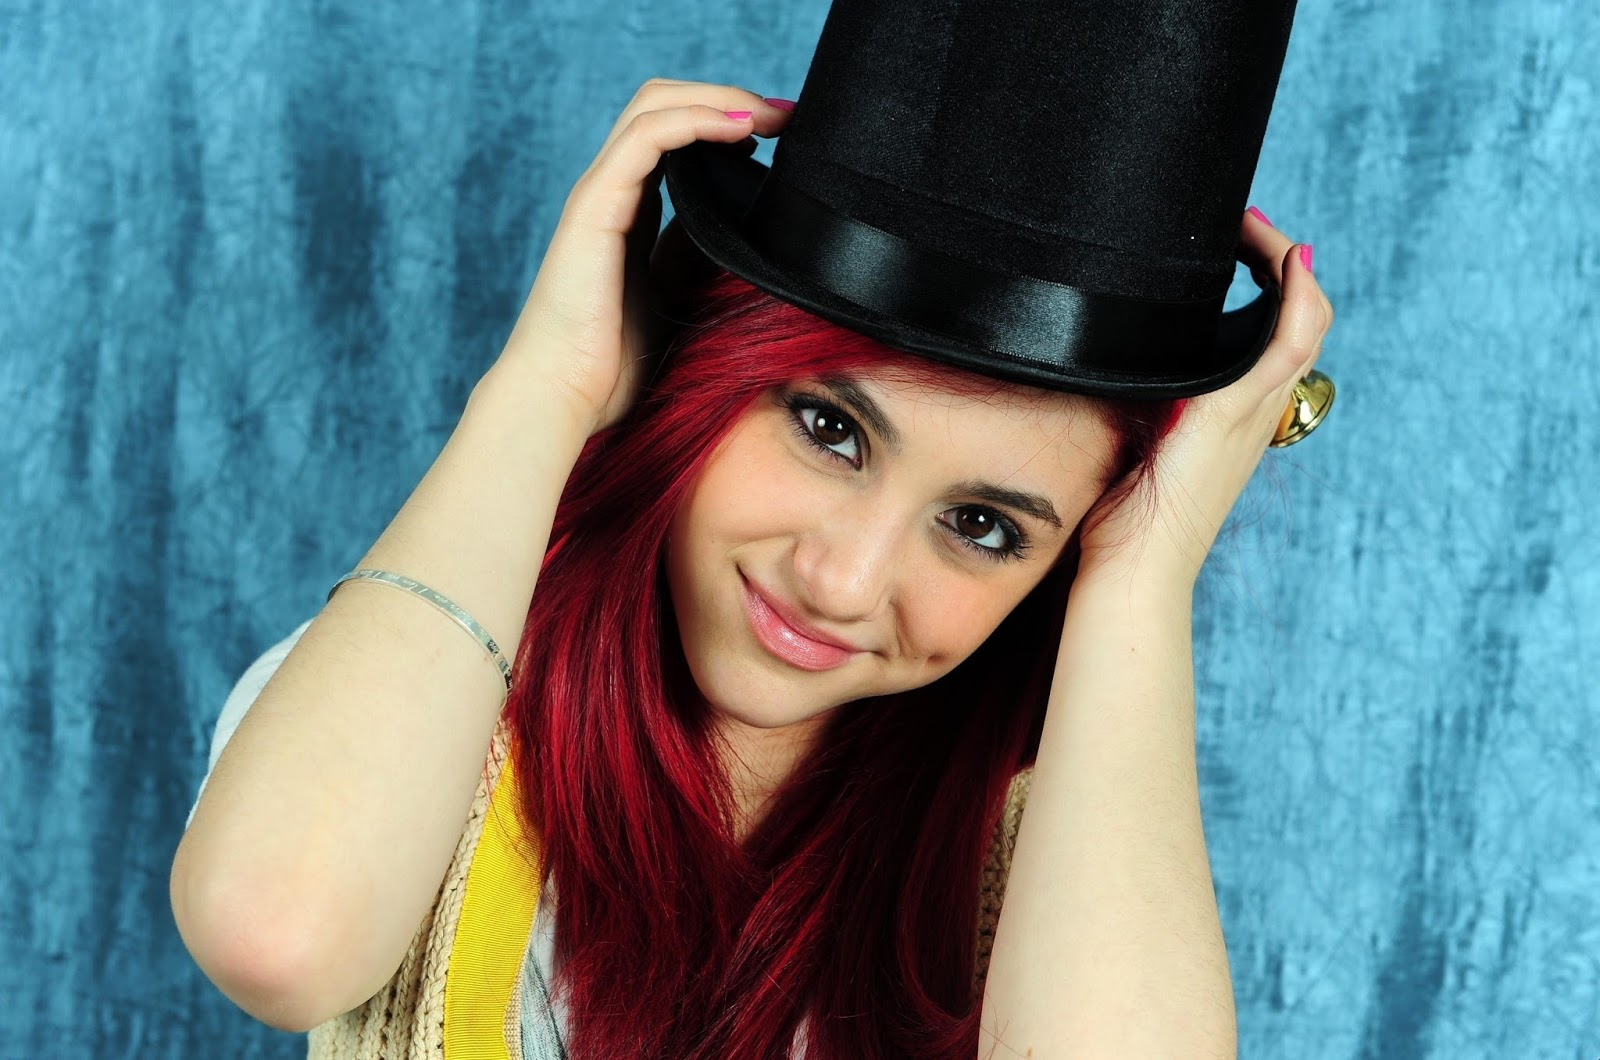 Ariana Grande Wallpapers Free